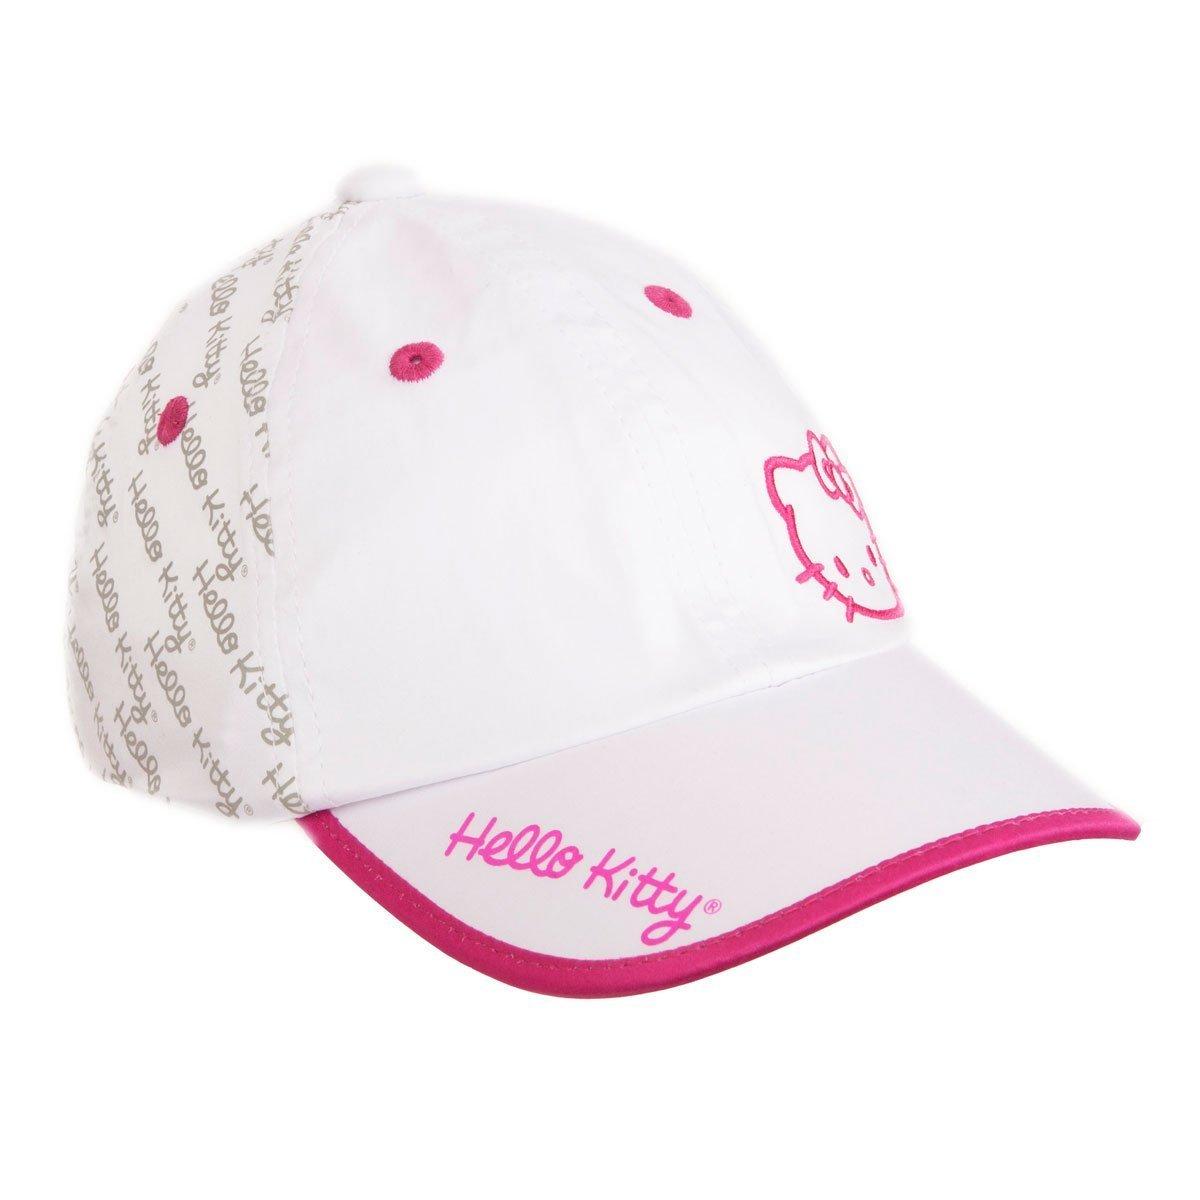 Hello Kitty Golf 3 Item - Kit -''The Collection'' Golf Balls (6 balls) + Hello Kitty Sports Script Hat (1 pc.) + Hello Kitty Premier Collection Divot Tool (1 pc.)